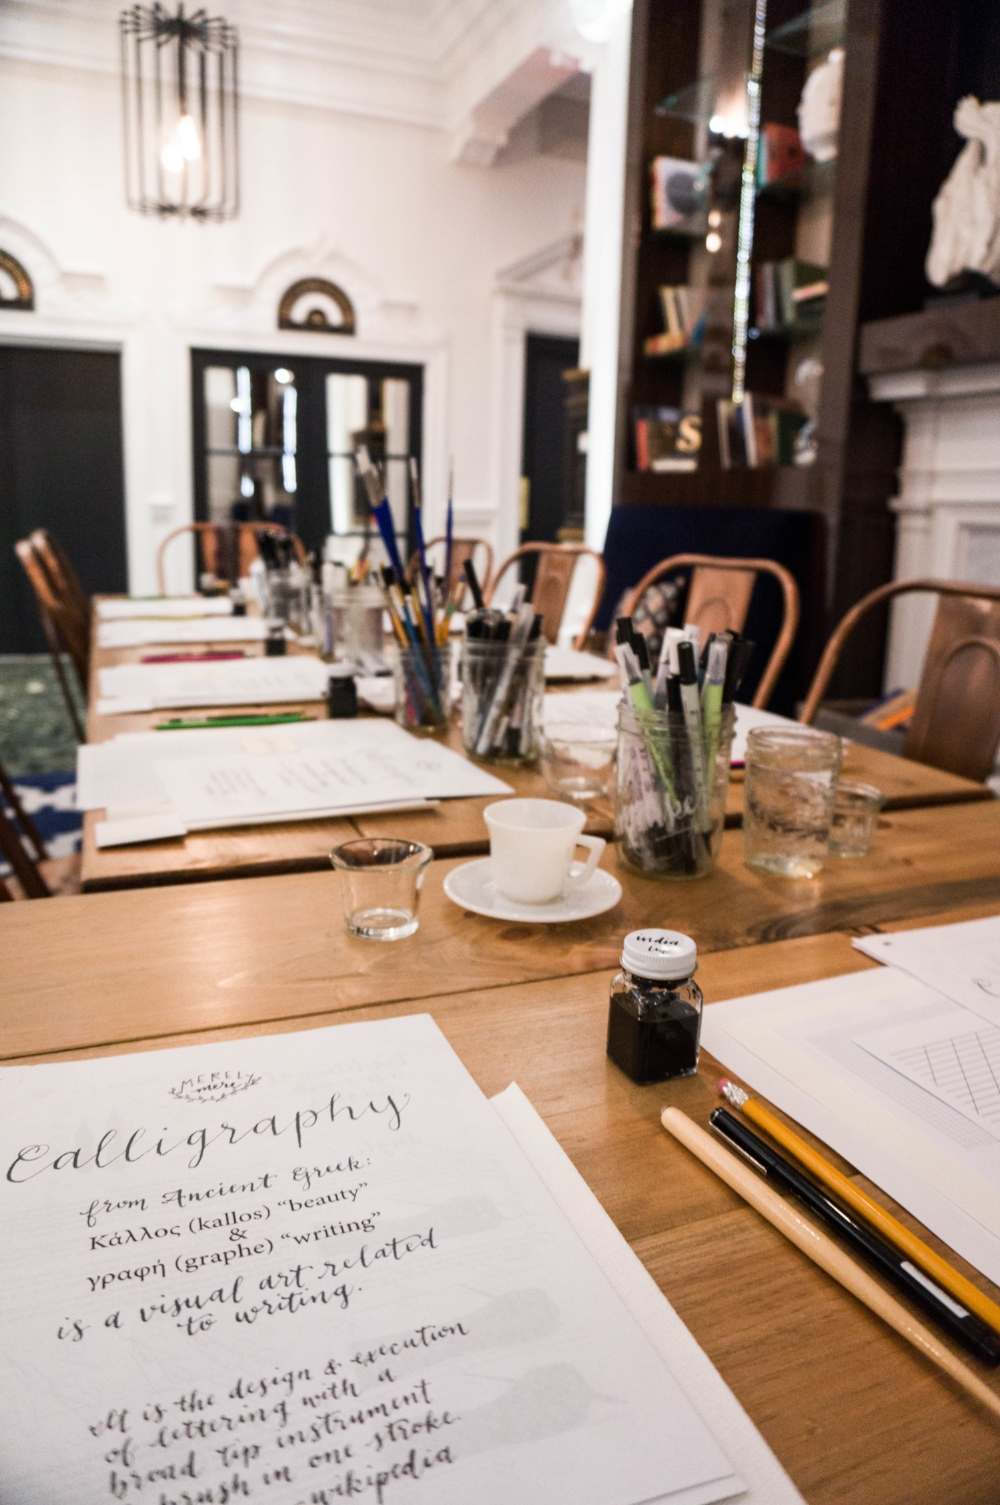 CalligraphyWorkshop-2.jpg